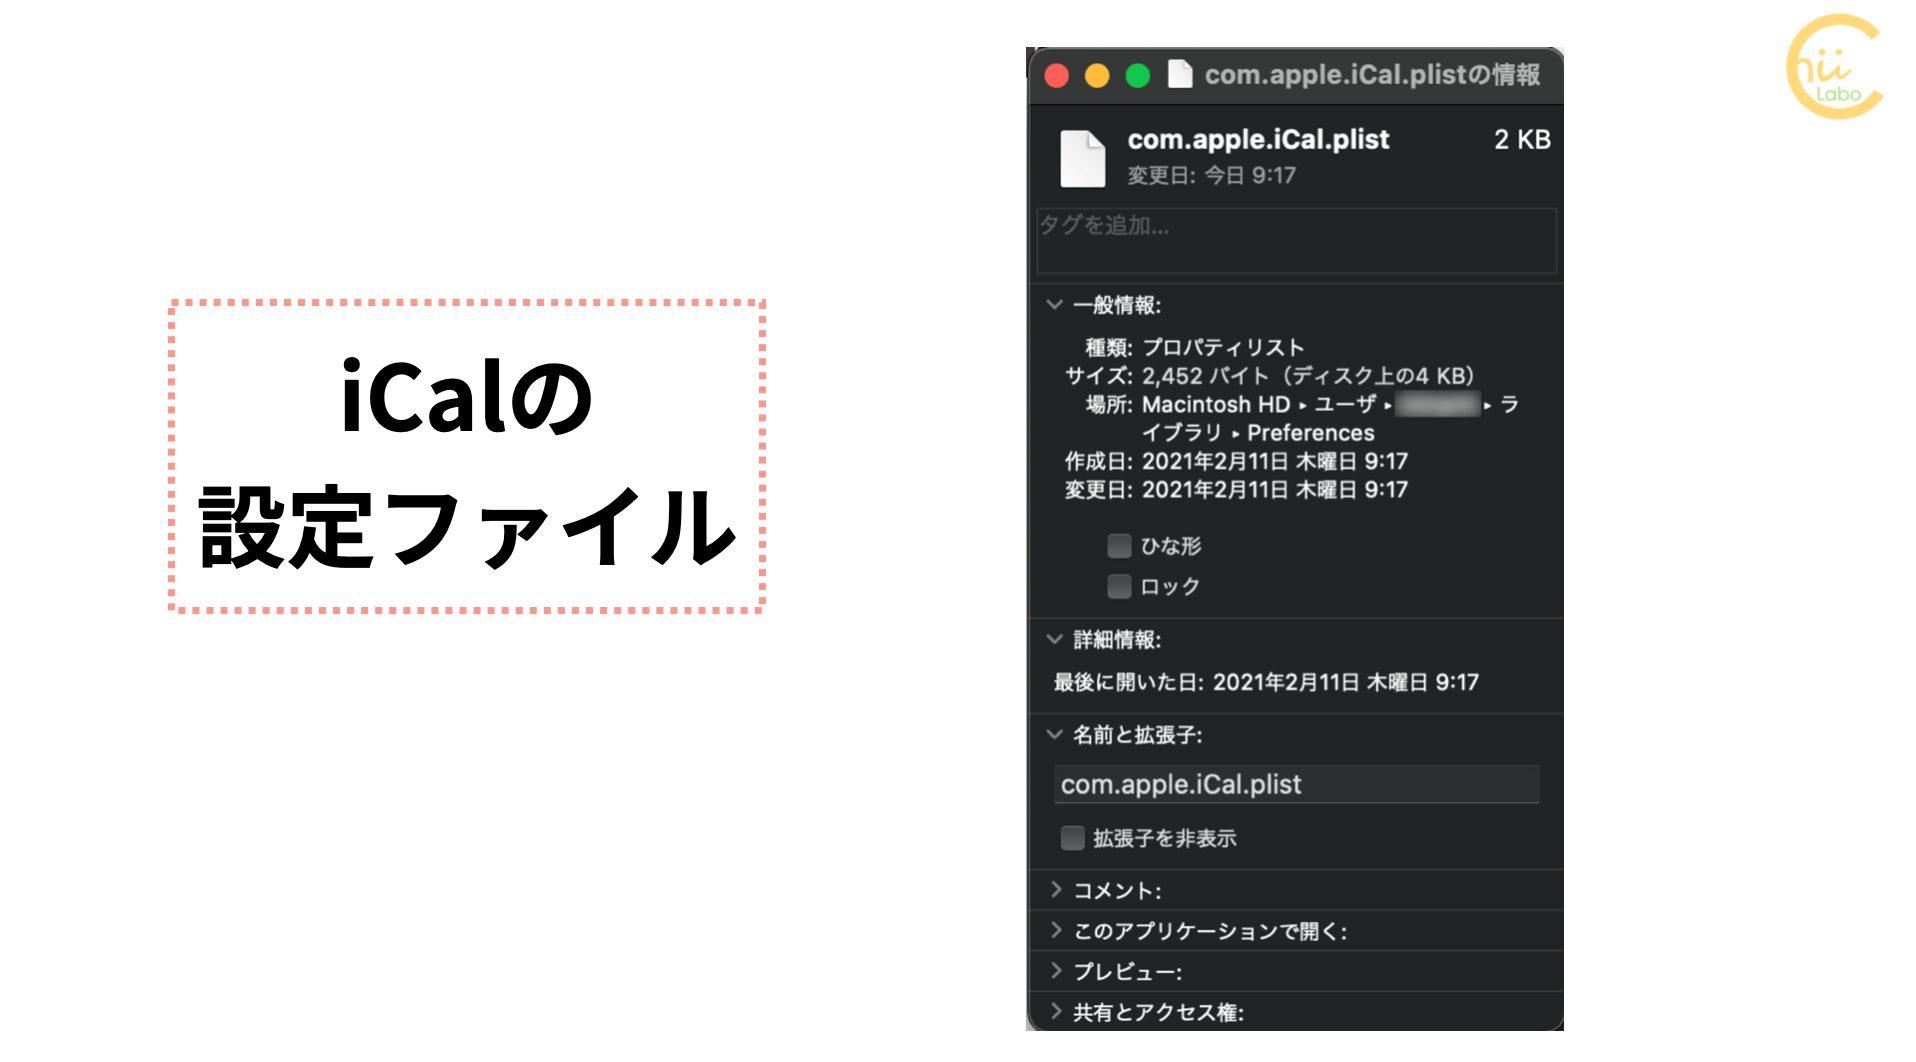 iCal.plistの情報